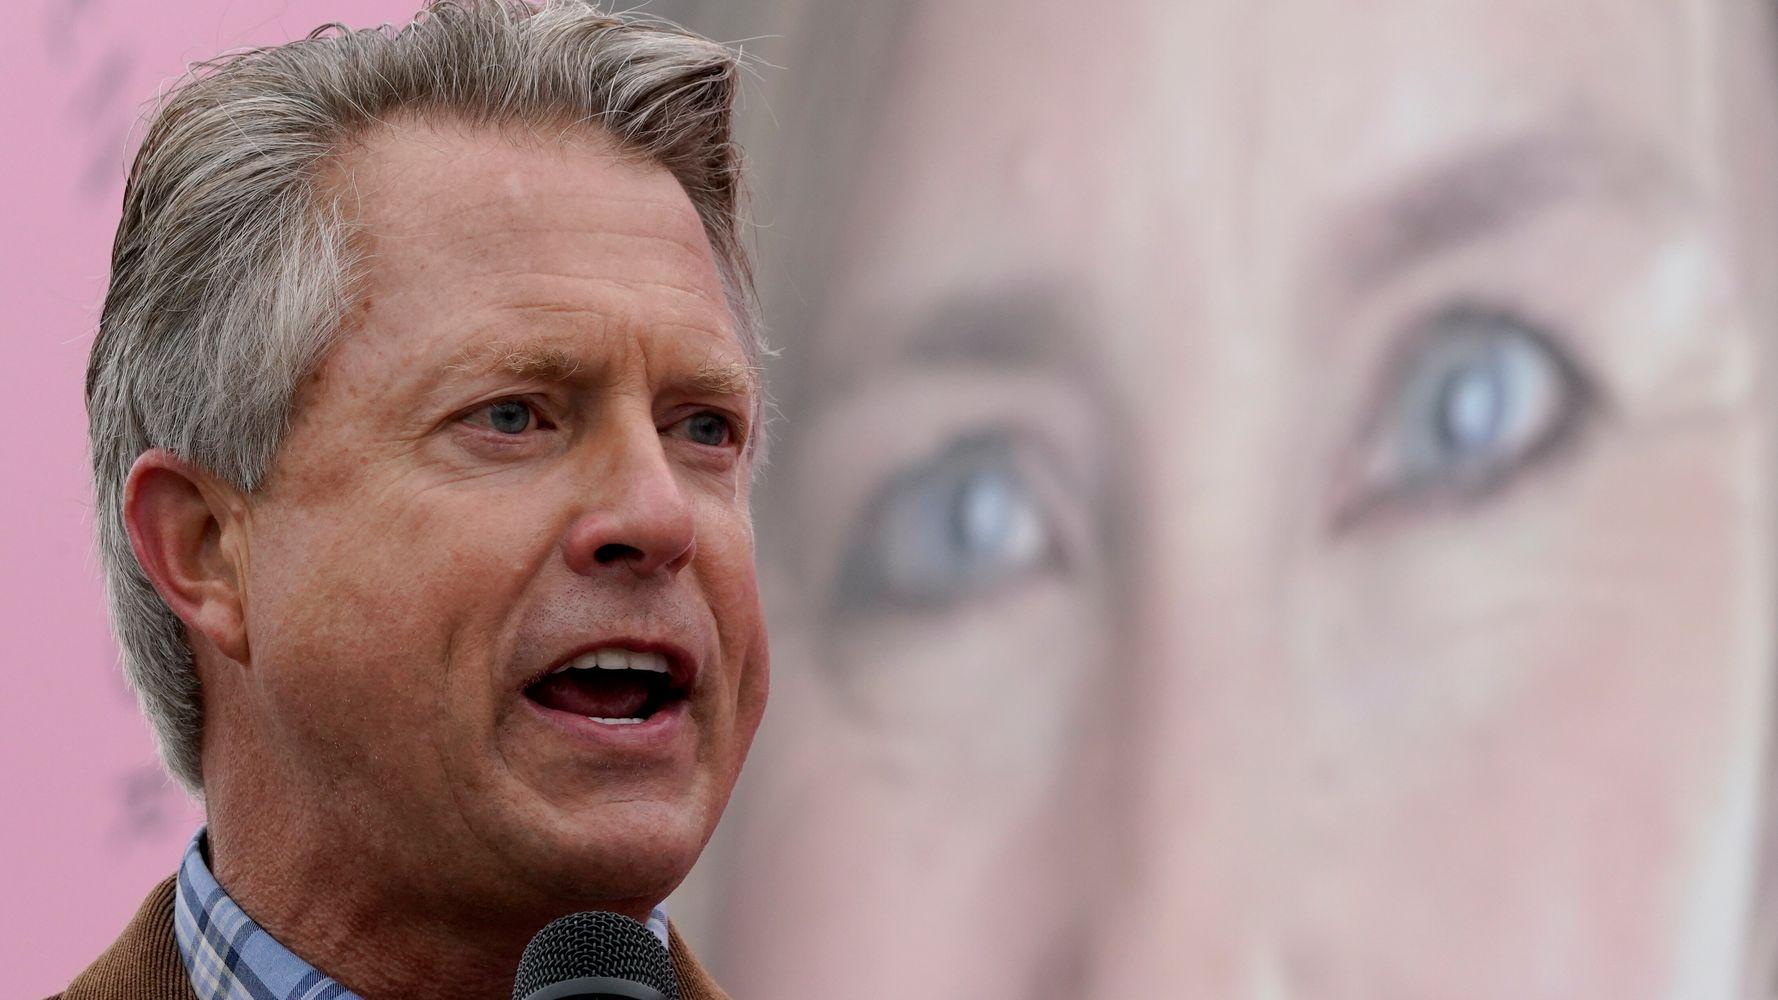 Republican Roger Marshall Wins Kansas Senate Seat, Spoiling Democratic Hopes Of An Upset